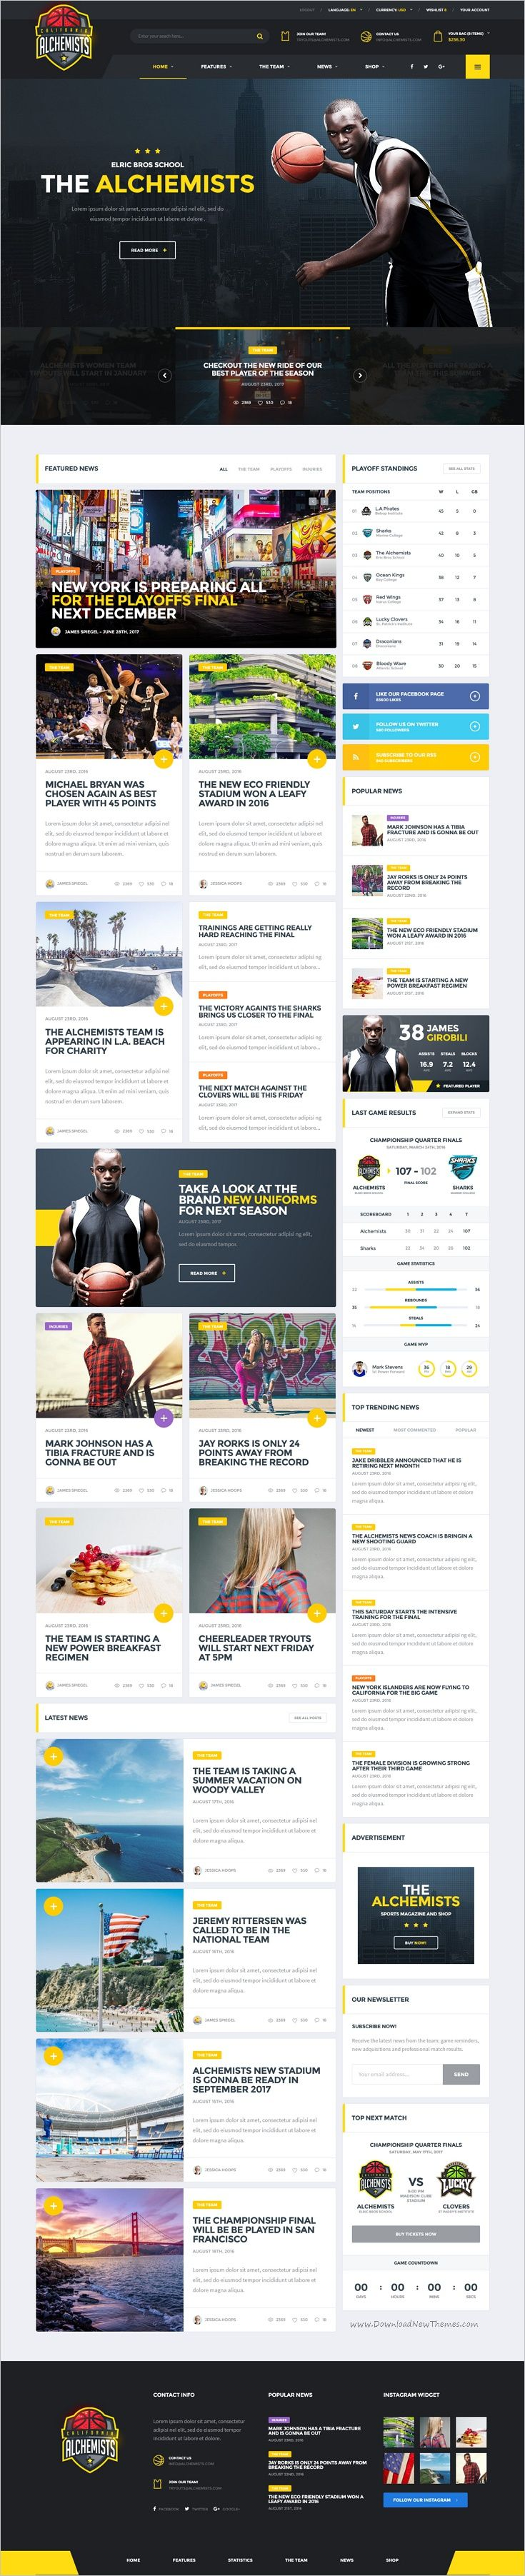 Alchemists - Basketball, Soccer, Football Sports Club and News HTML ...